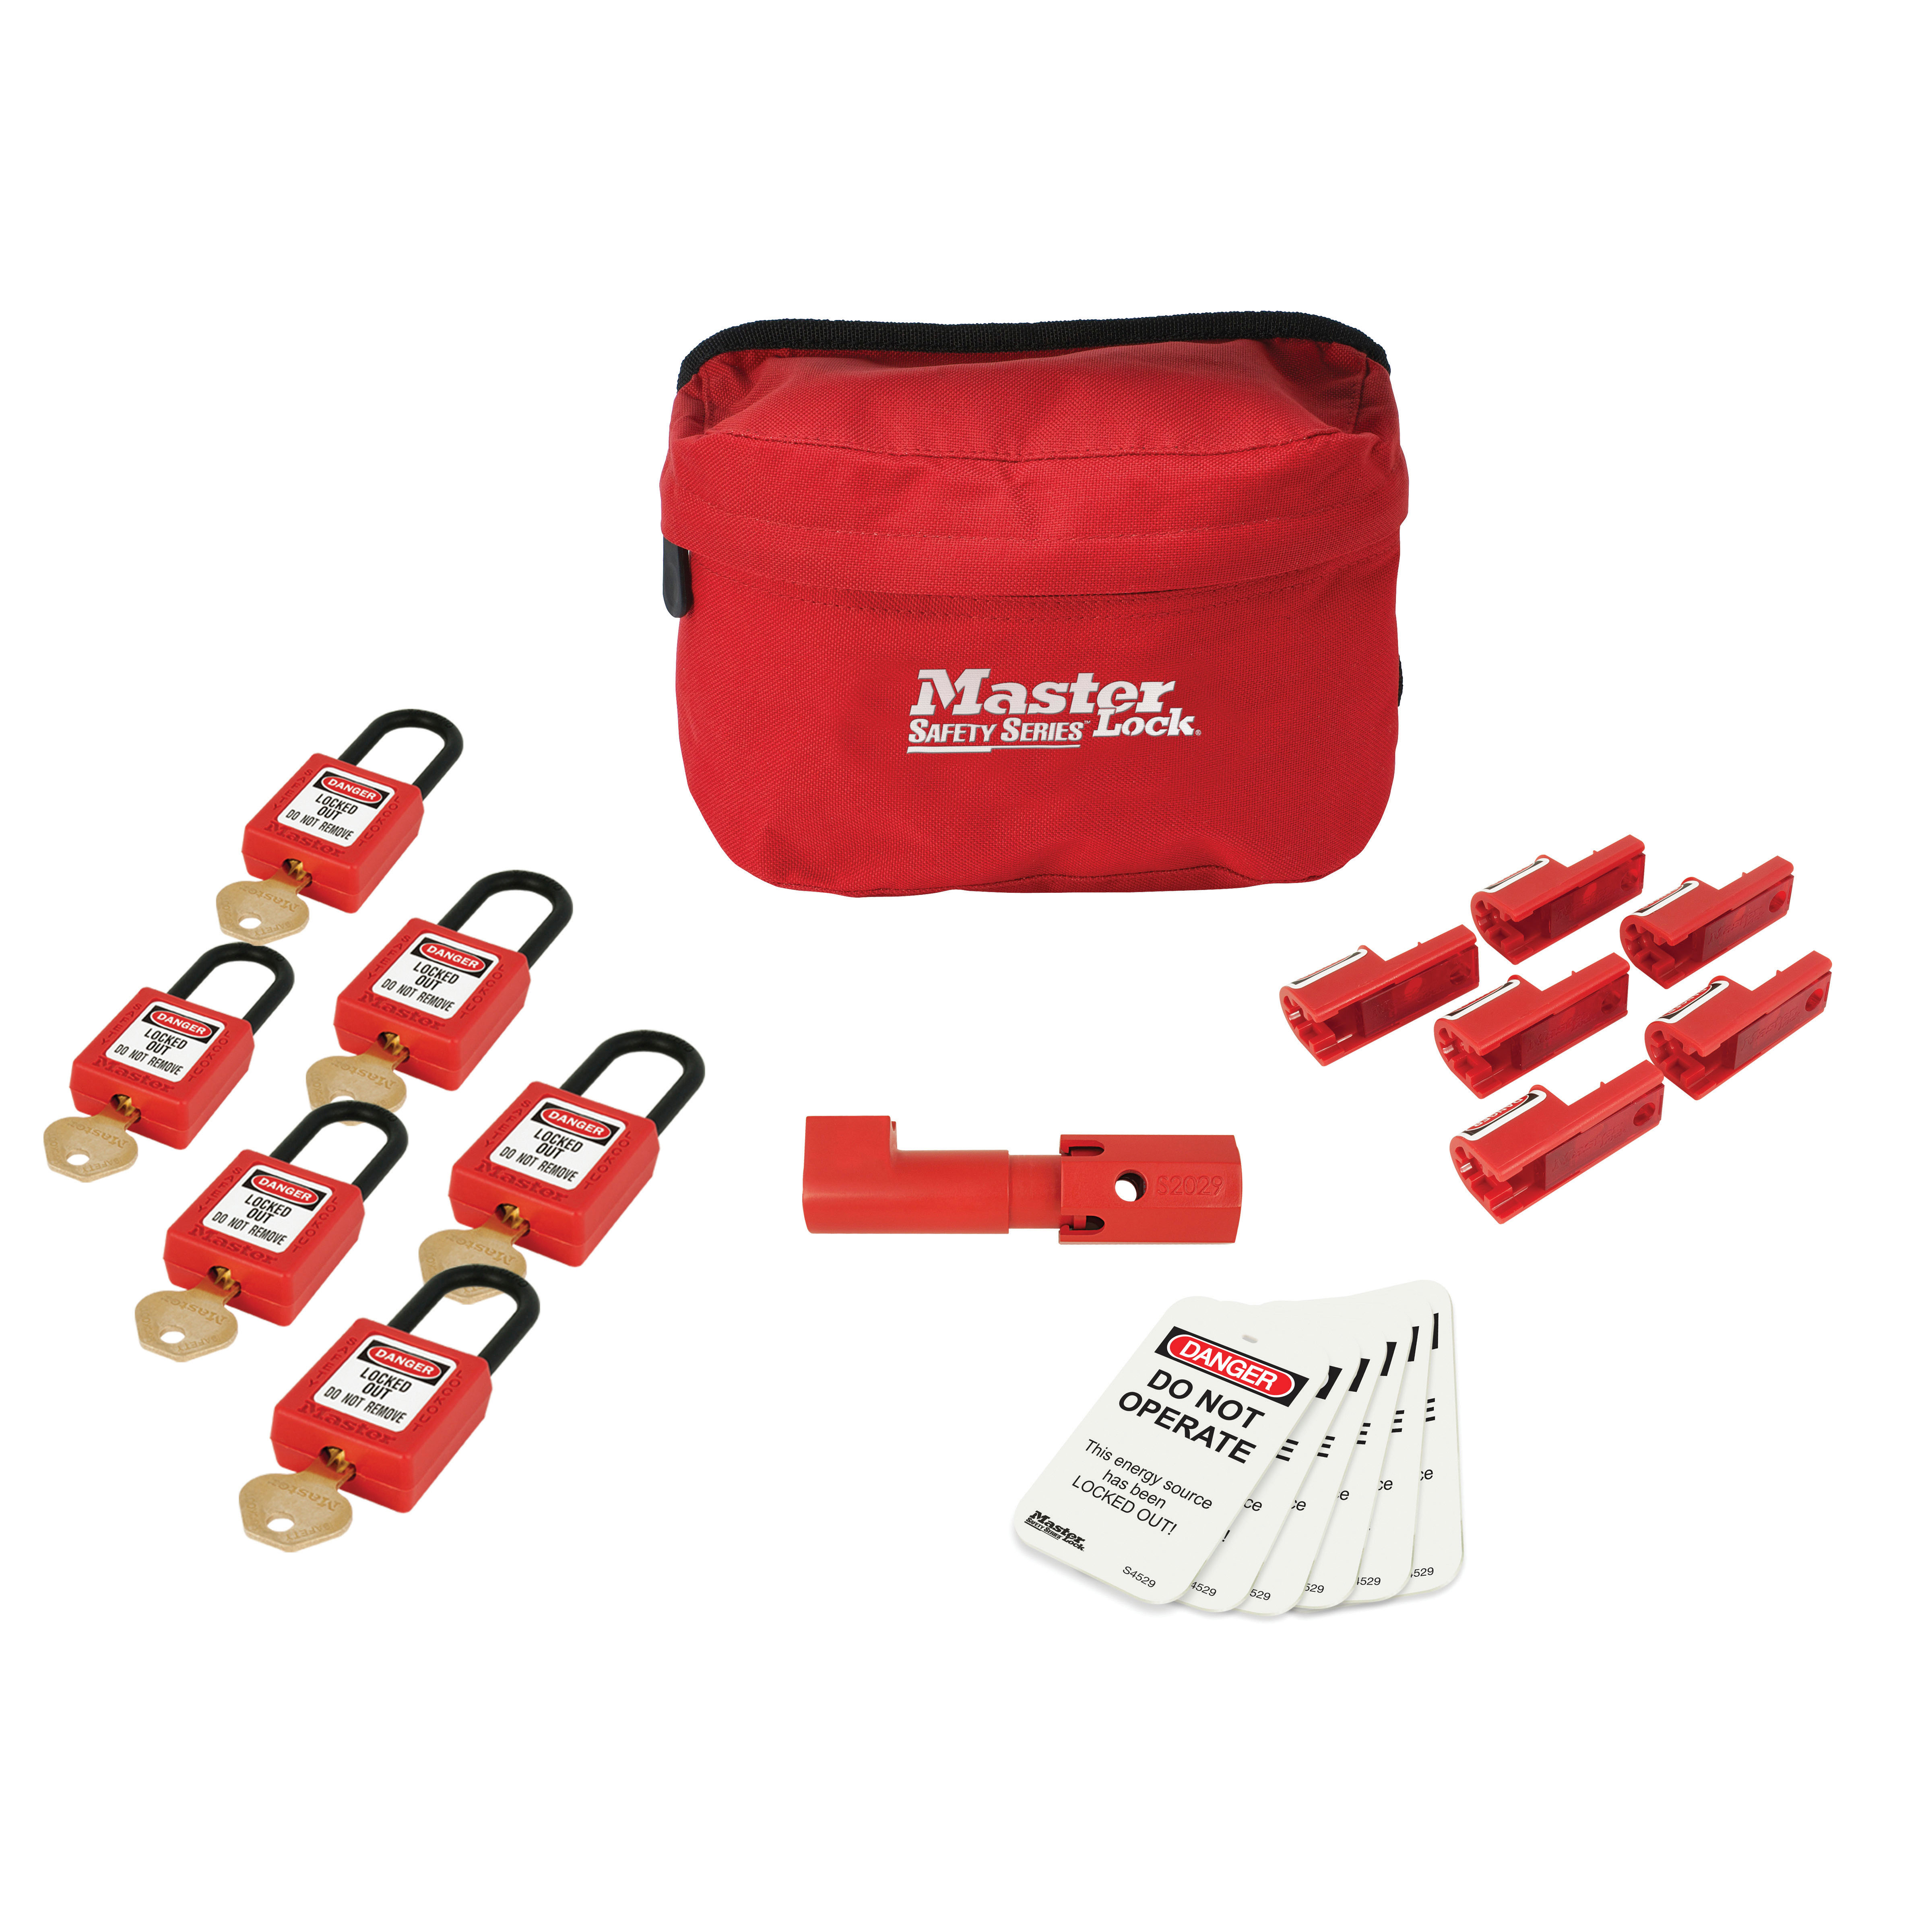 Master Lock Compact Aircraft Lockout Kit (410 Lock / 406 Lock)